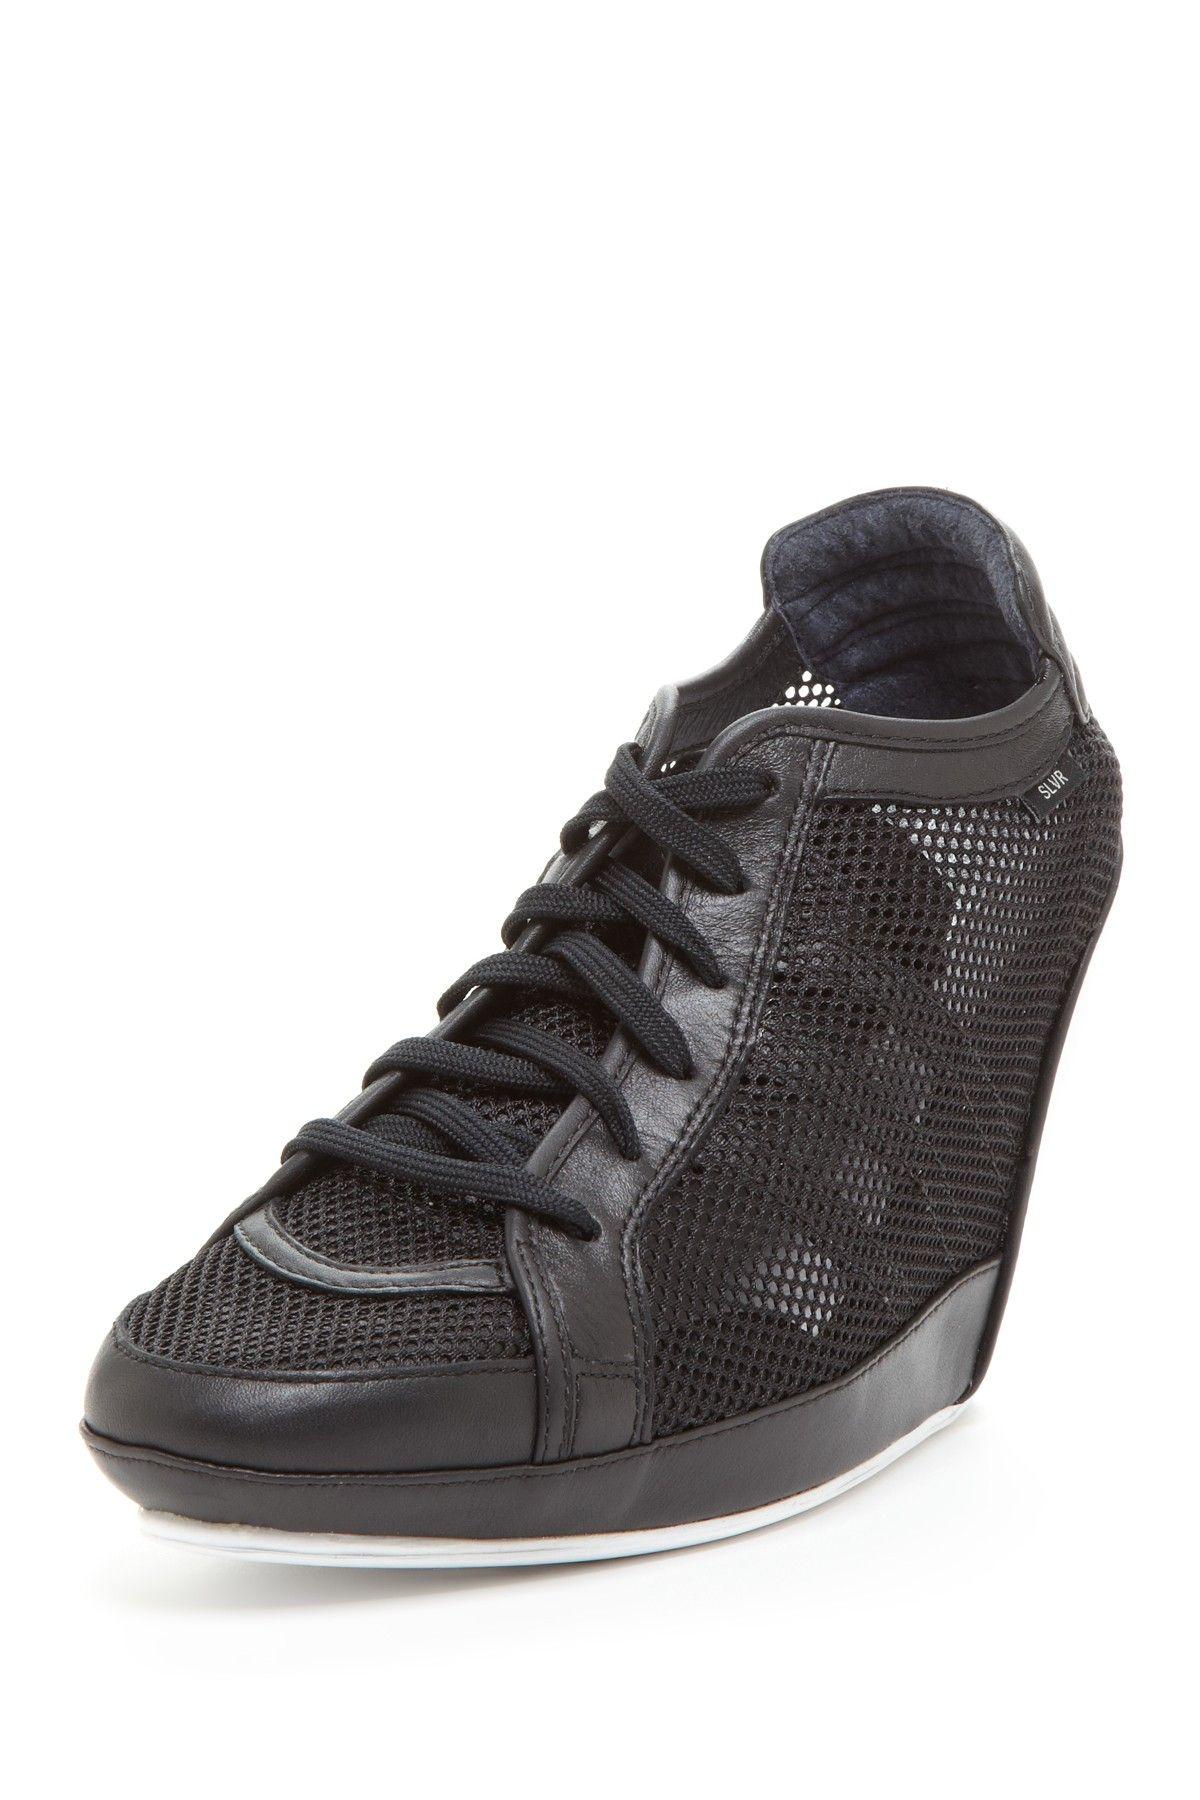 13b540f1eb Adidas SLVR Clima Wedge Sneaker Wedge  Sneaker  Lace-upWomen  Shoes ...